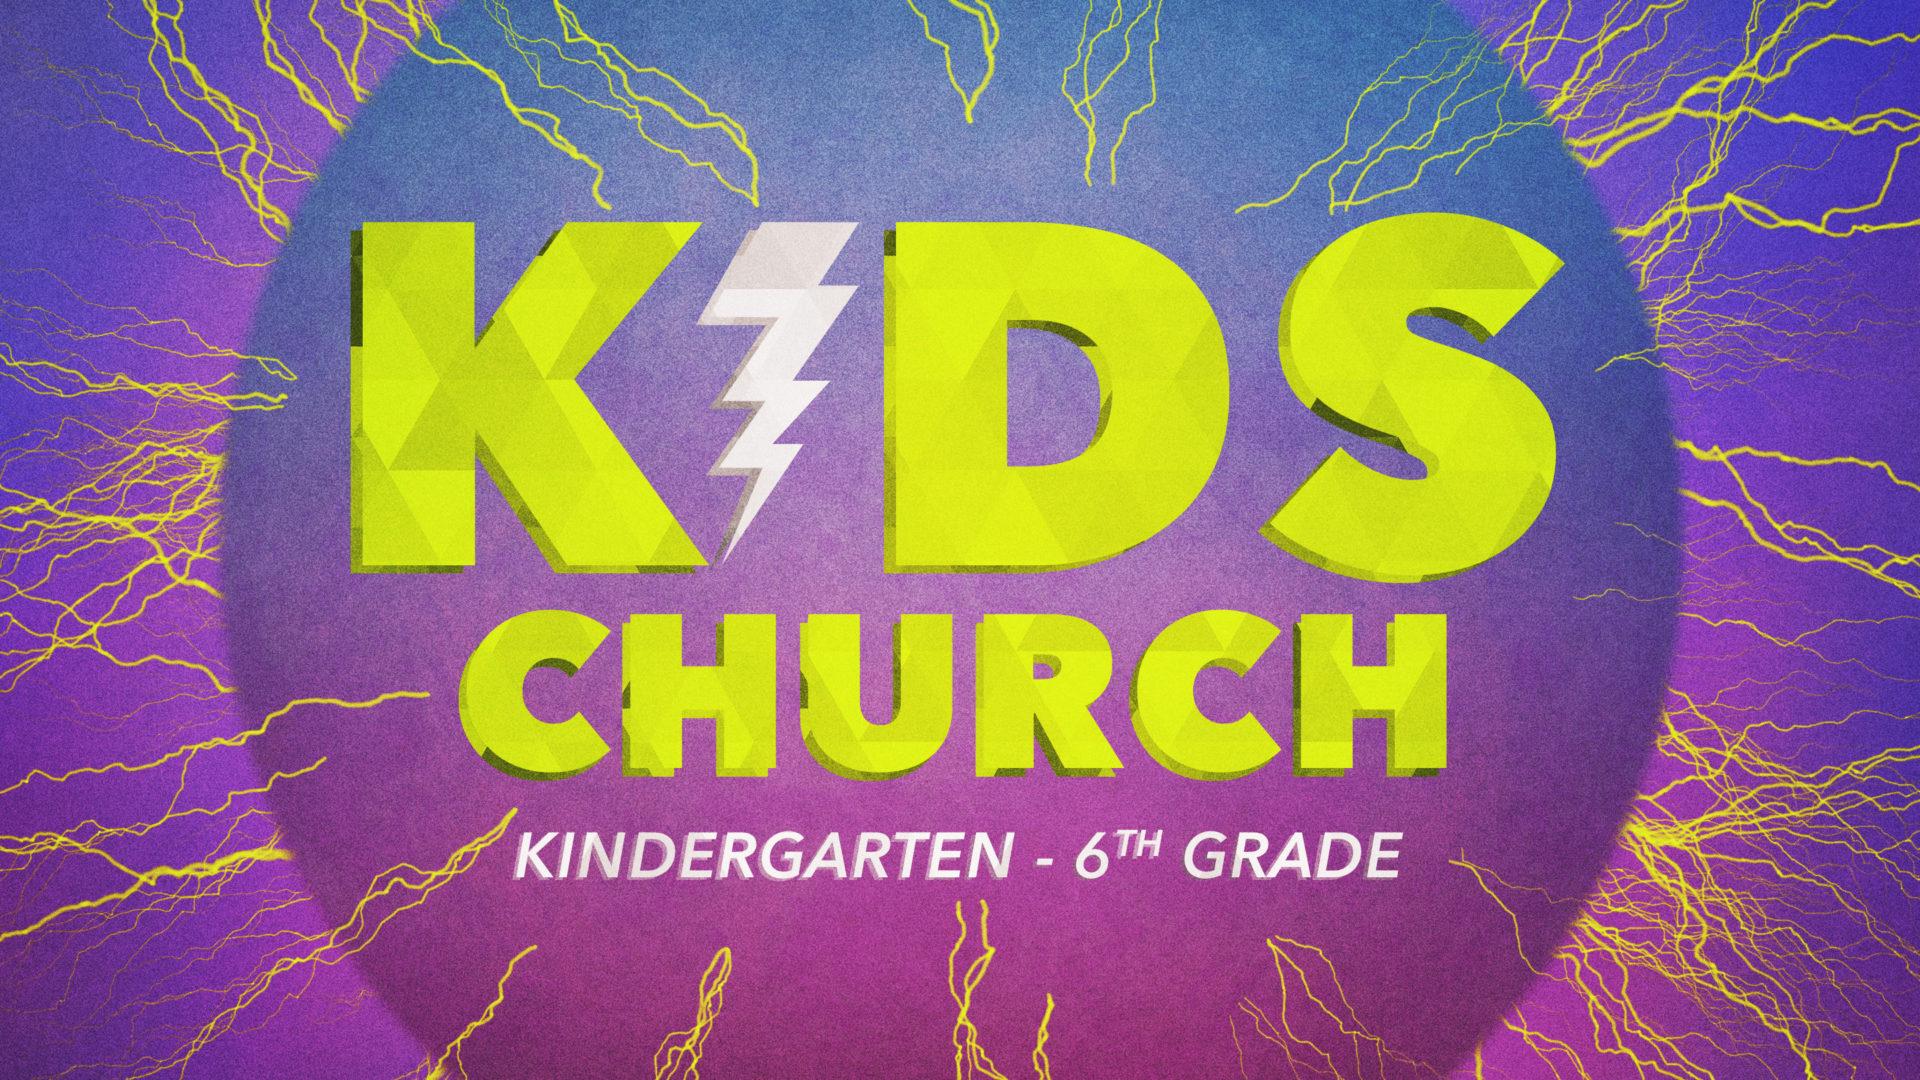 CHILDRENS_PAGE-kids_church-2